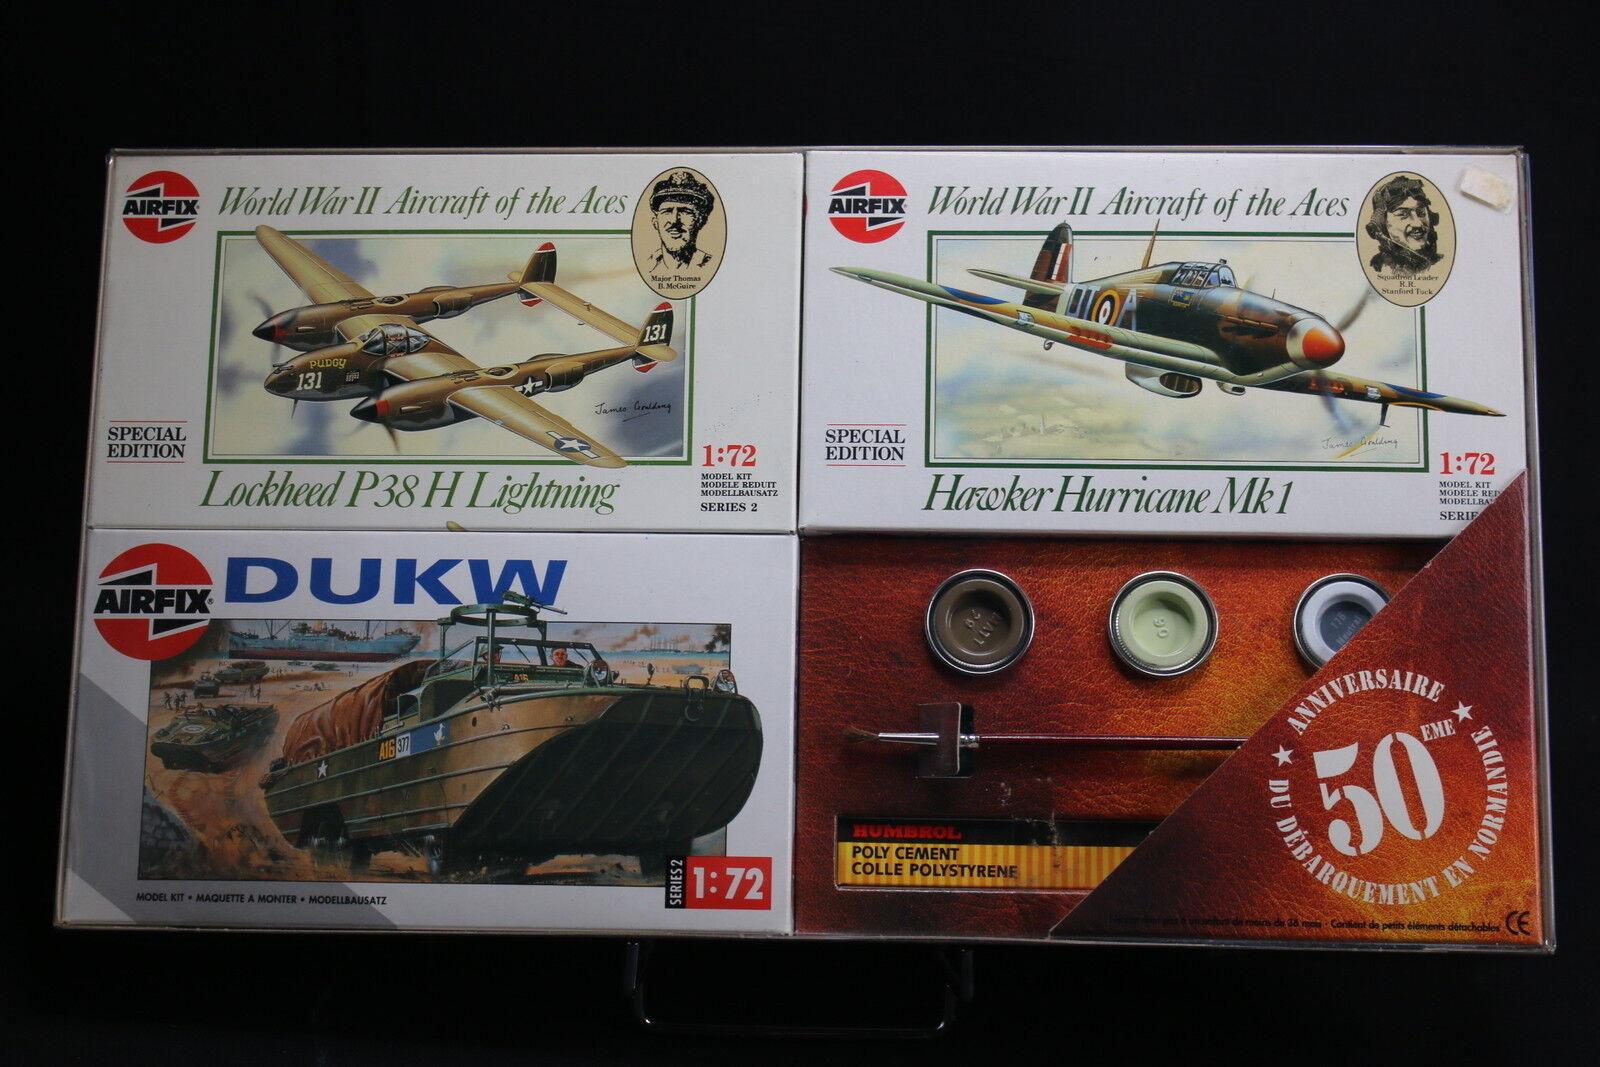 XM009 AIRFIX Collection Day 50 Anniversaire débarquement 02088 02082 02316 WWII